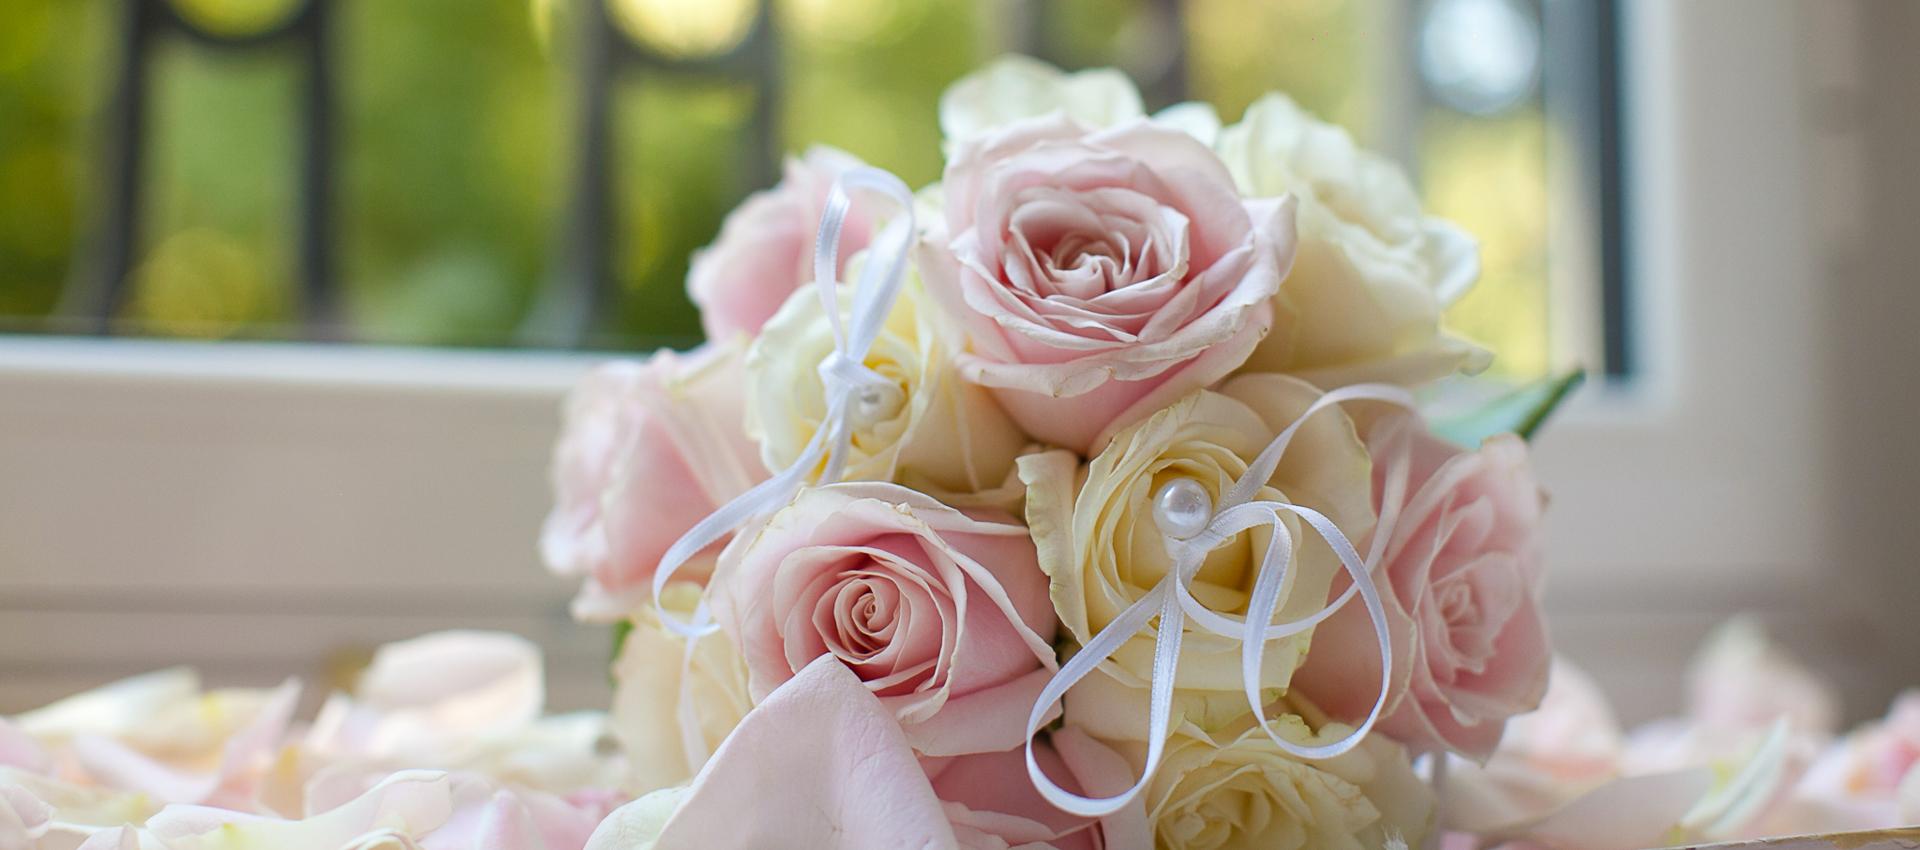 mariage-haut-de-gamme-organsa-wedding-planner-wedding-video-photo-2